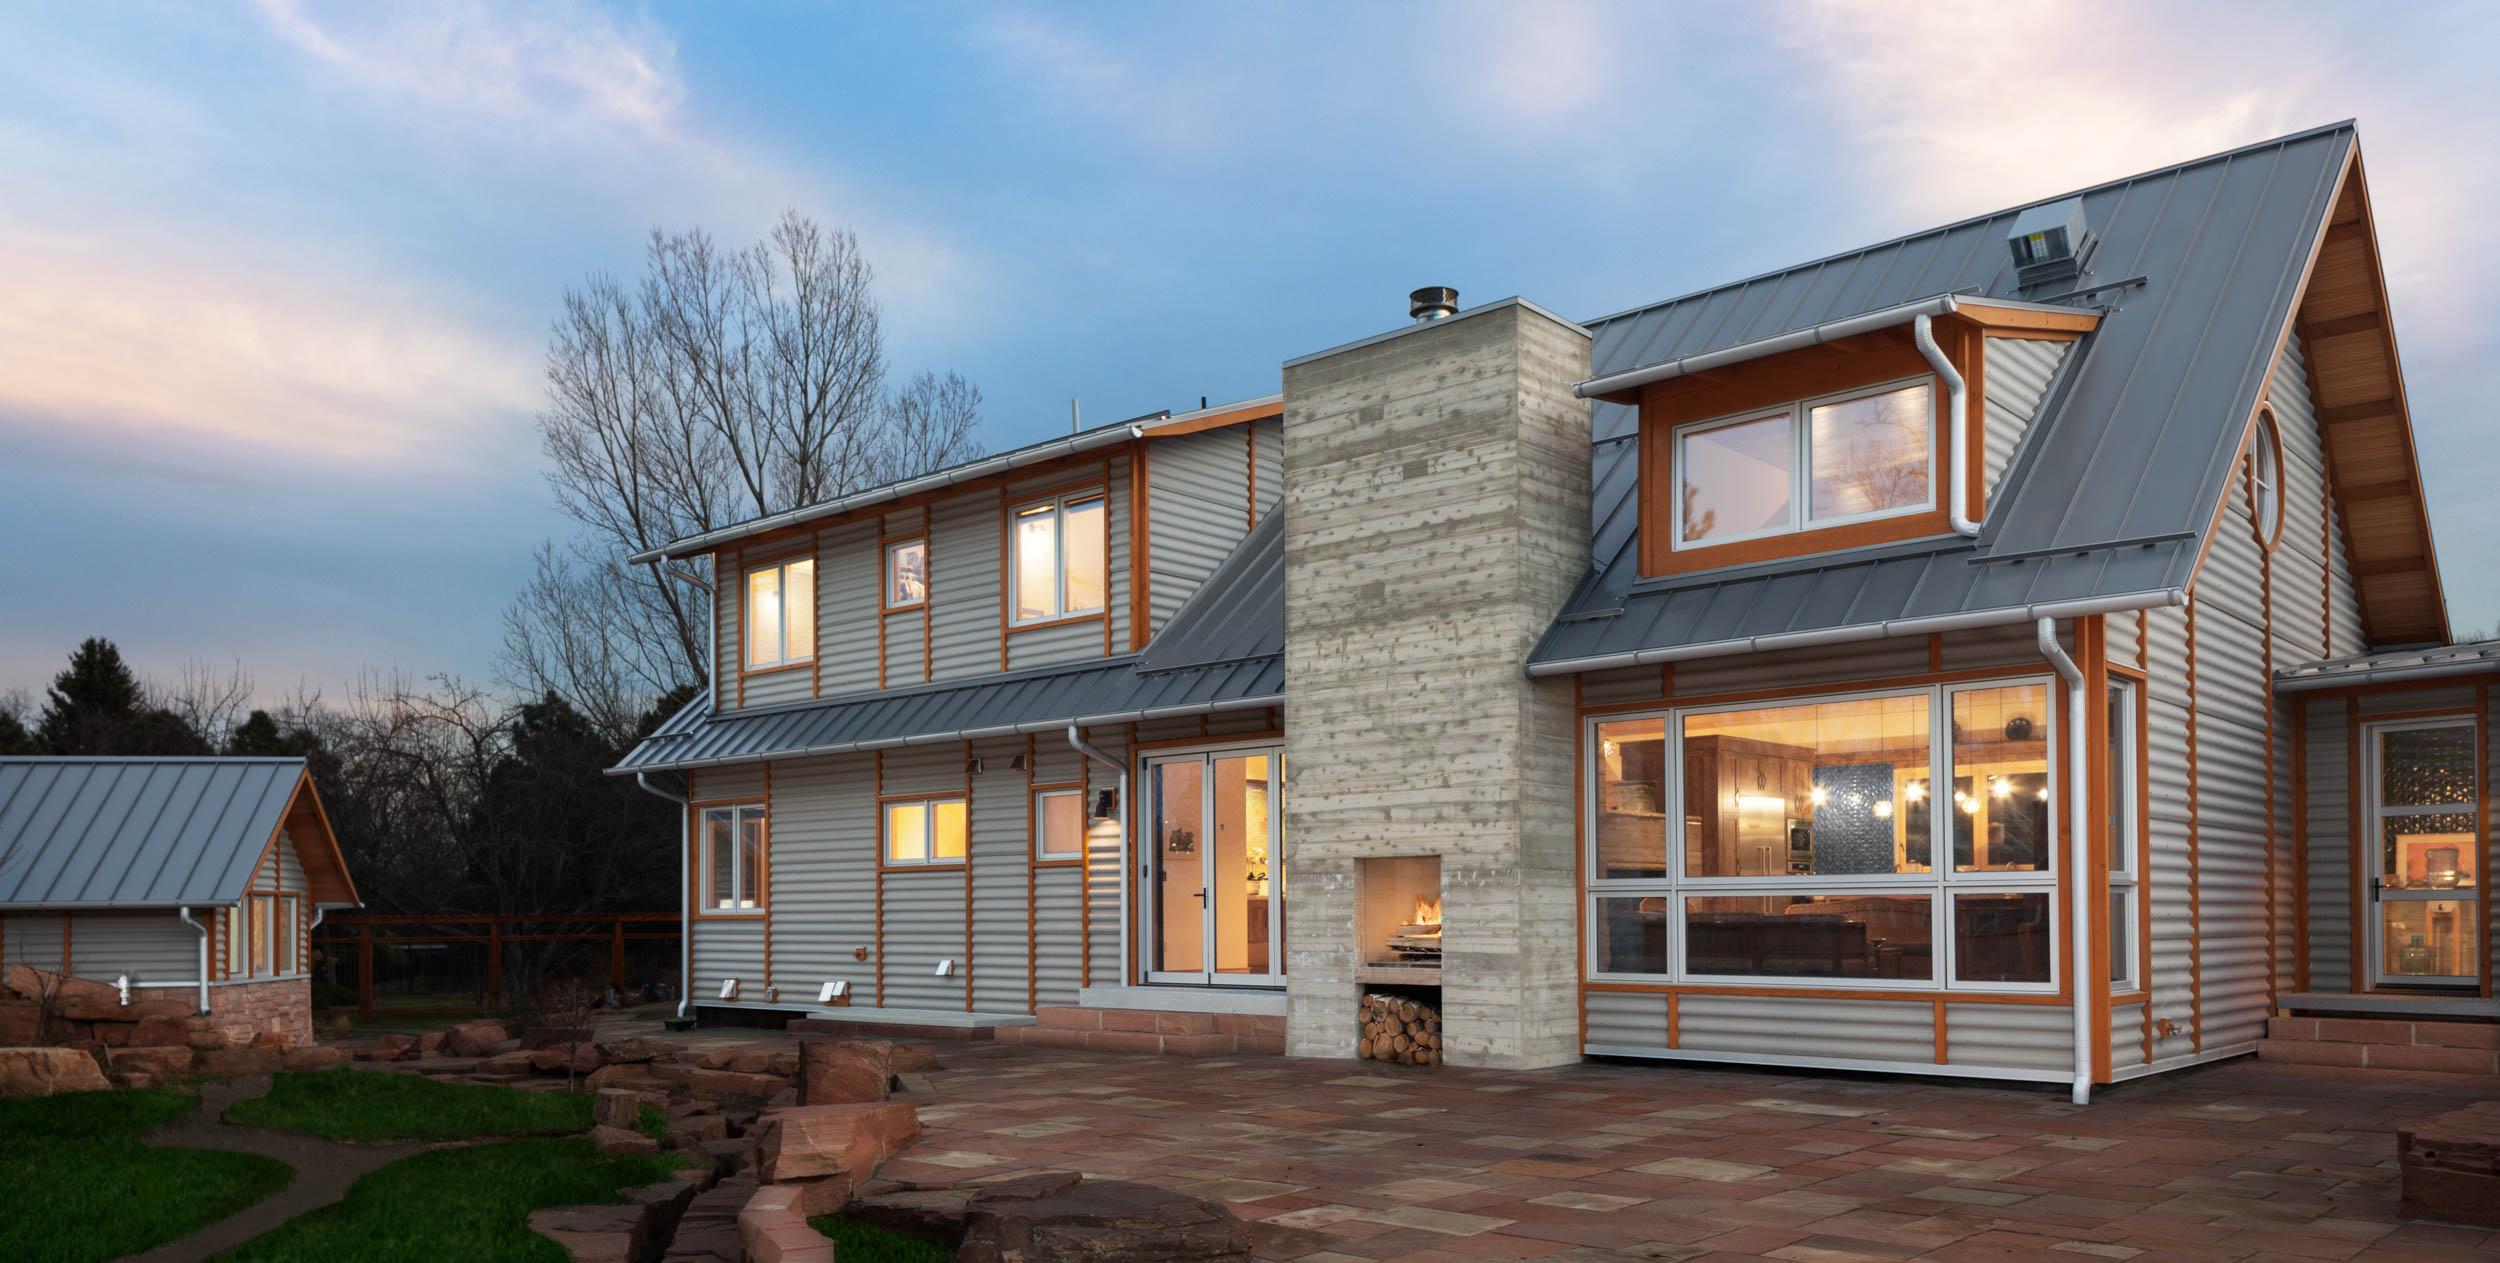 Architect: George Watt @ George Watt Architecture